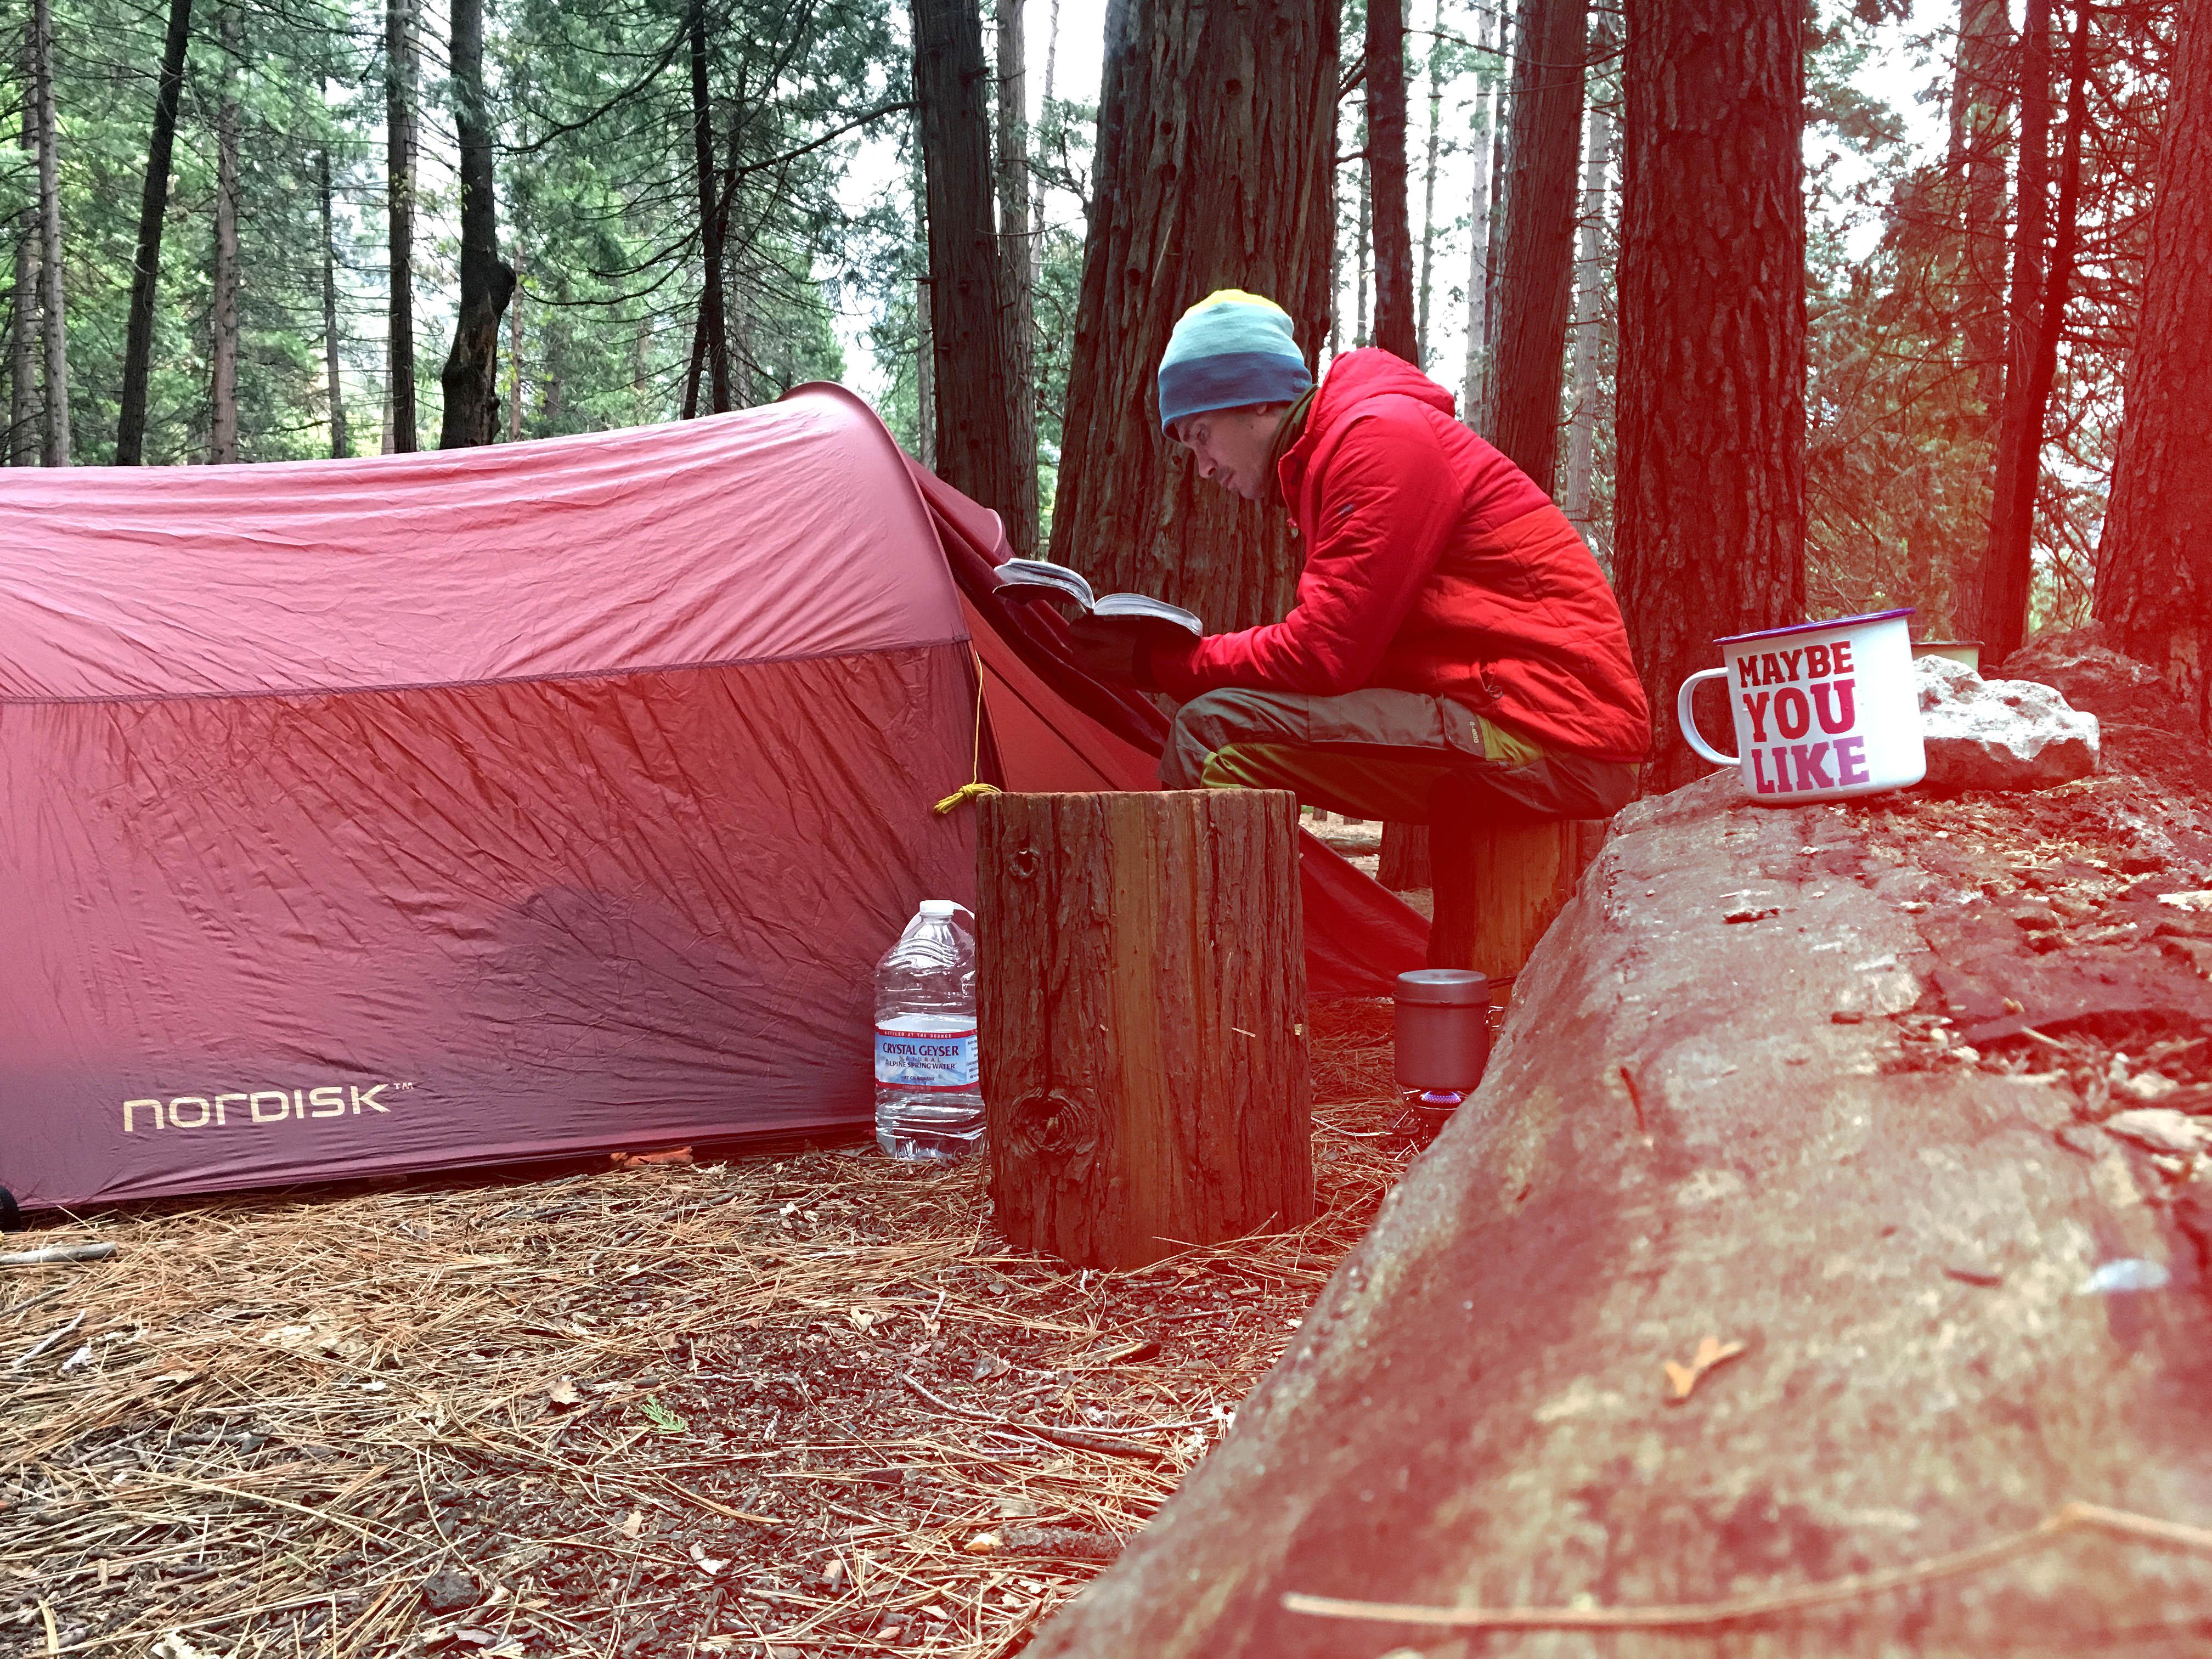 maybeyoulike_camping_gear11